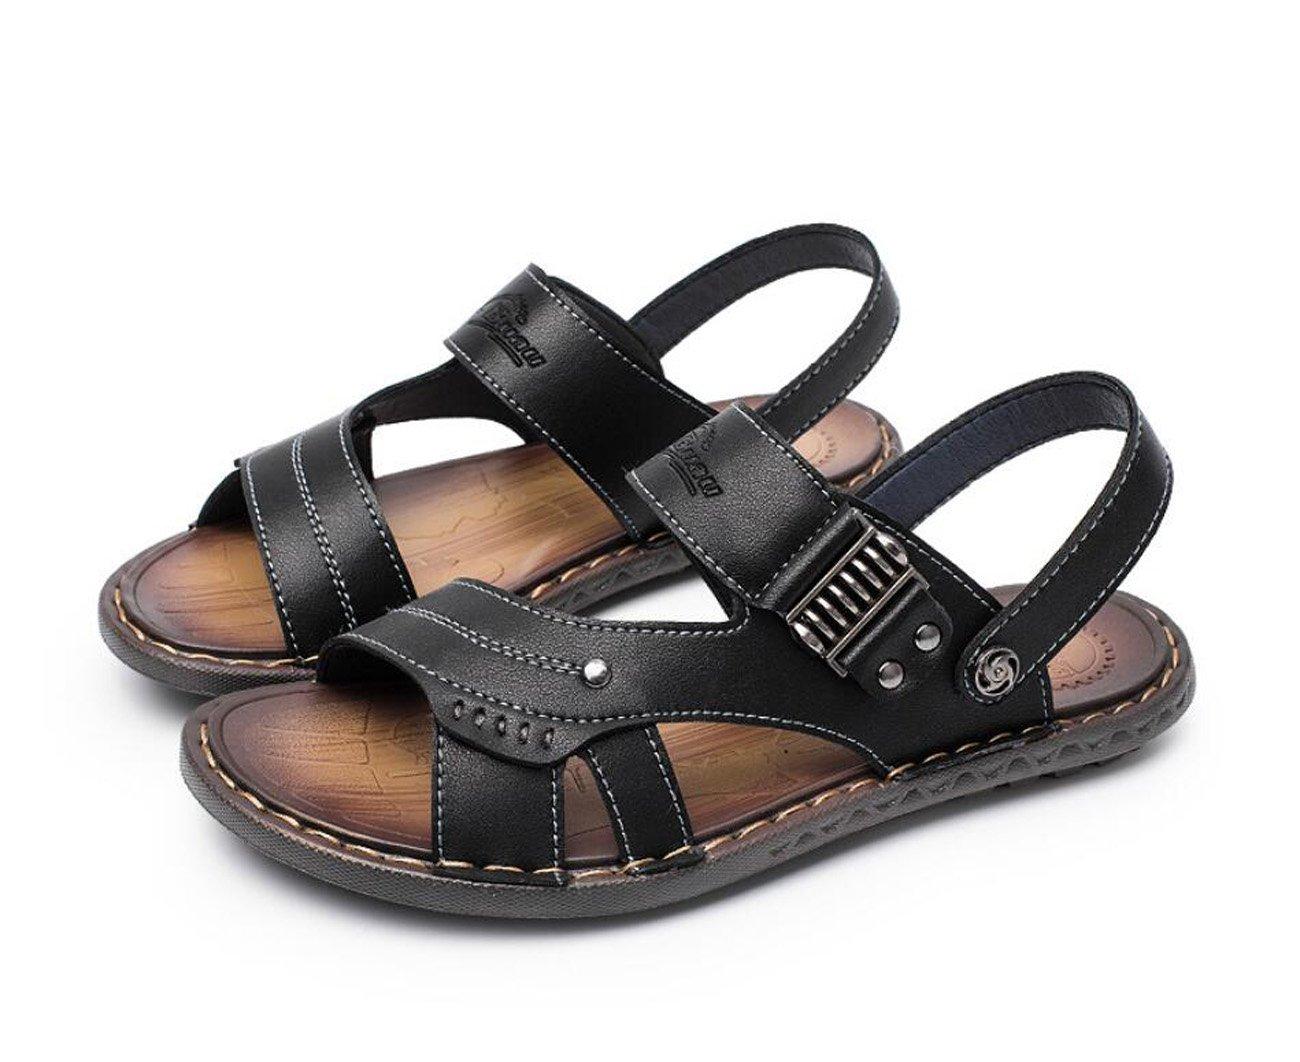 Sommer Flip Flops Herren Sandalen Leder Flip Flops Strand Hausschuhe Verschleißfeste Mode Schuhe Dual Use ( Color : Black   Größe : 40 ) Black